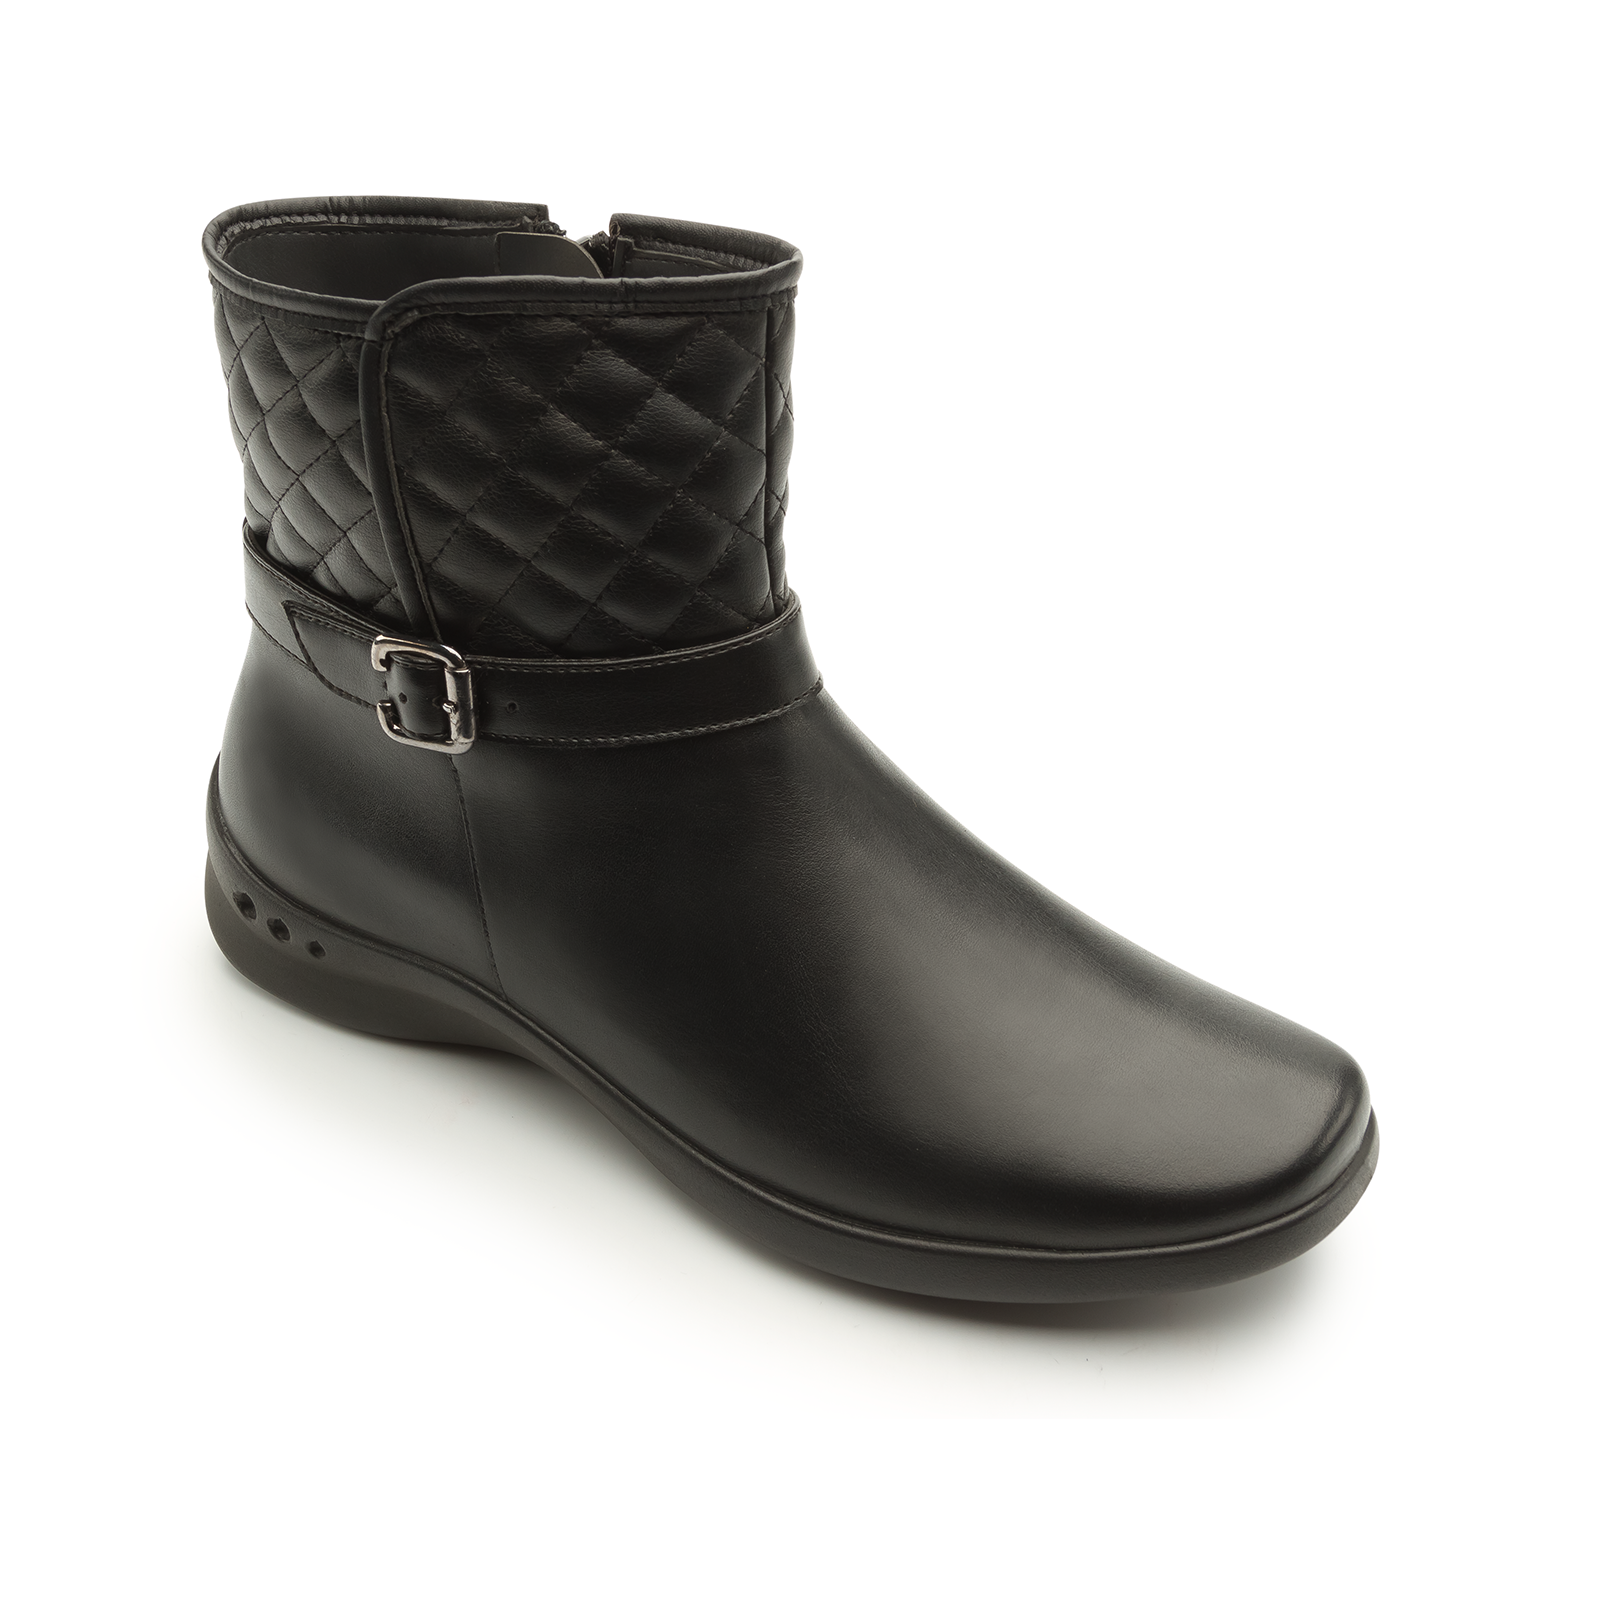 7f889519 Botas para Dama Flexi al mejor precio - Zapatos Flexi México